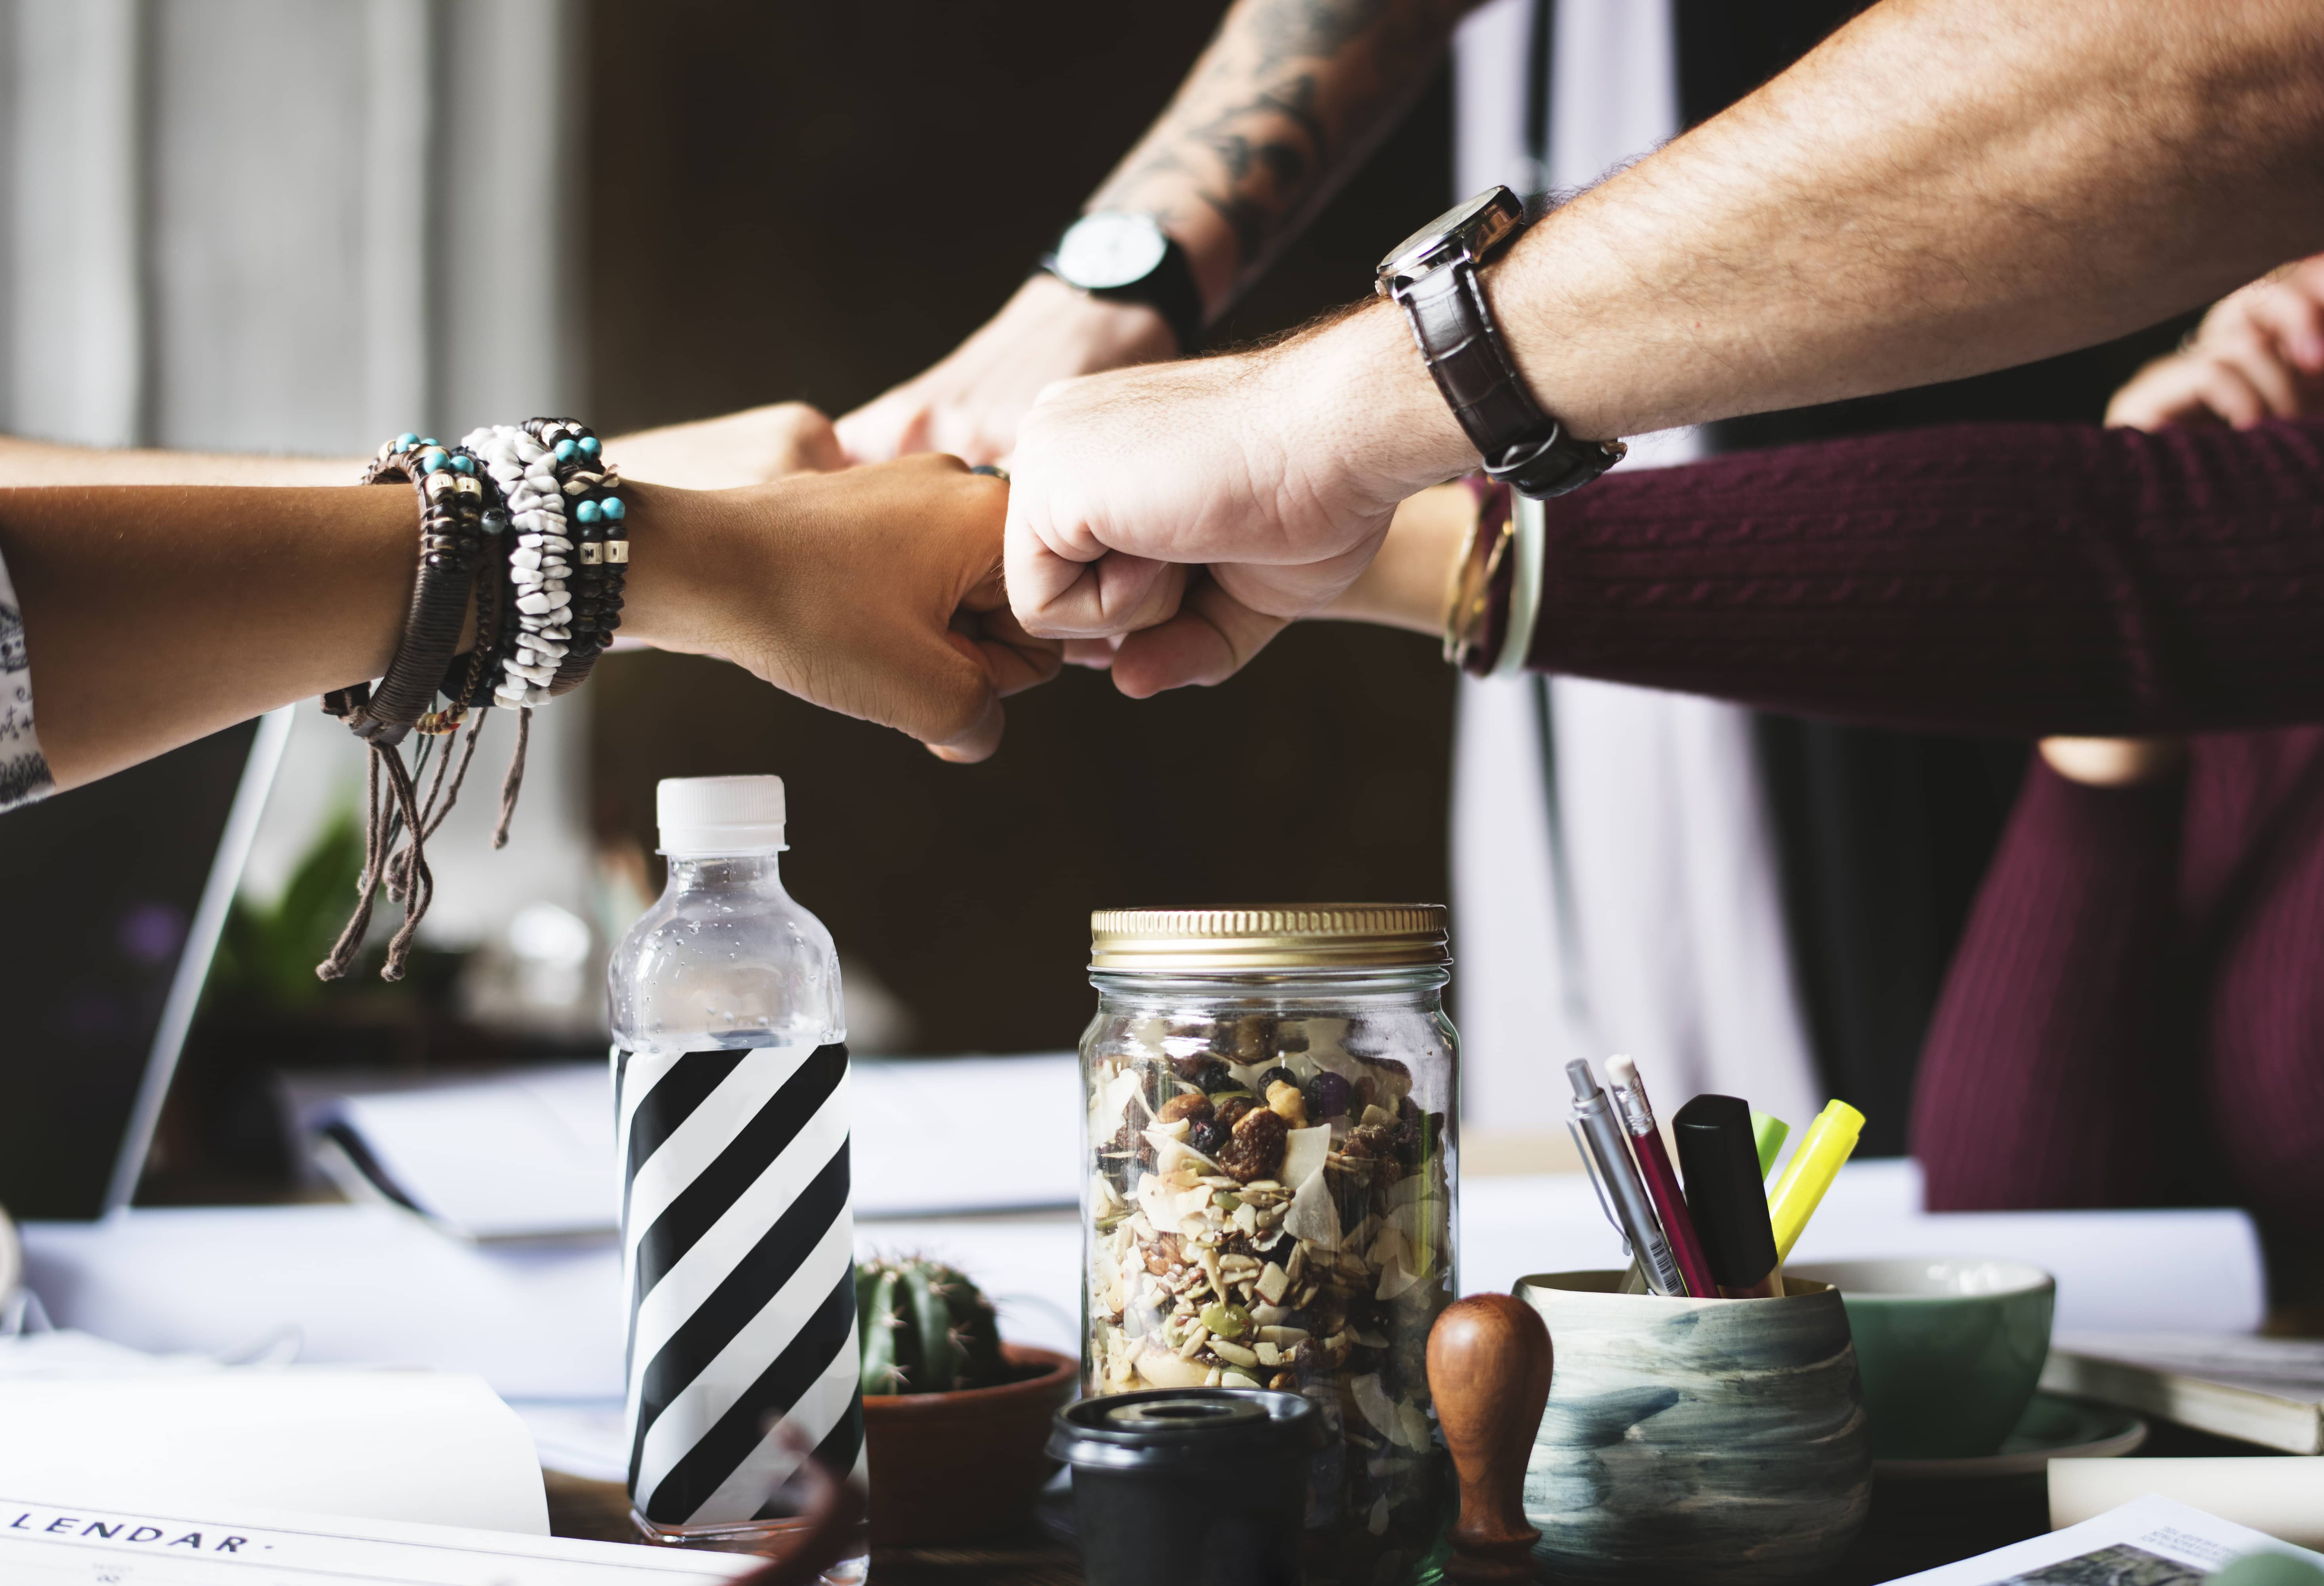 How to Develop an Effective Employee Training Program